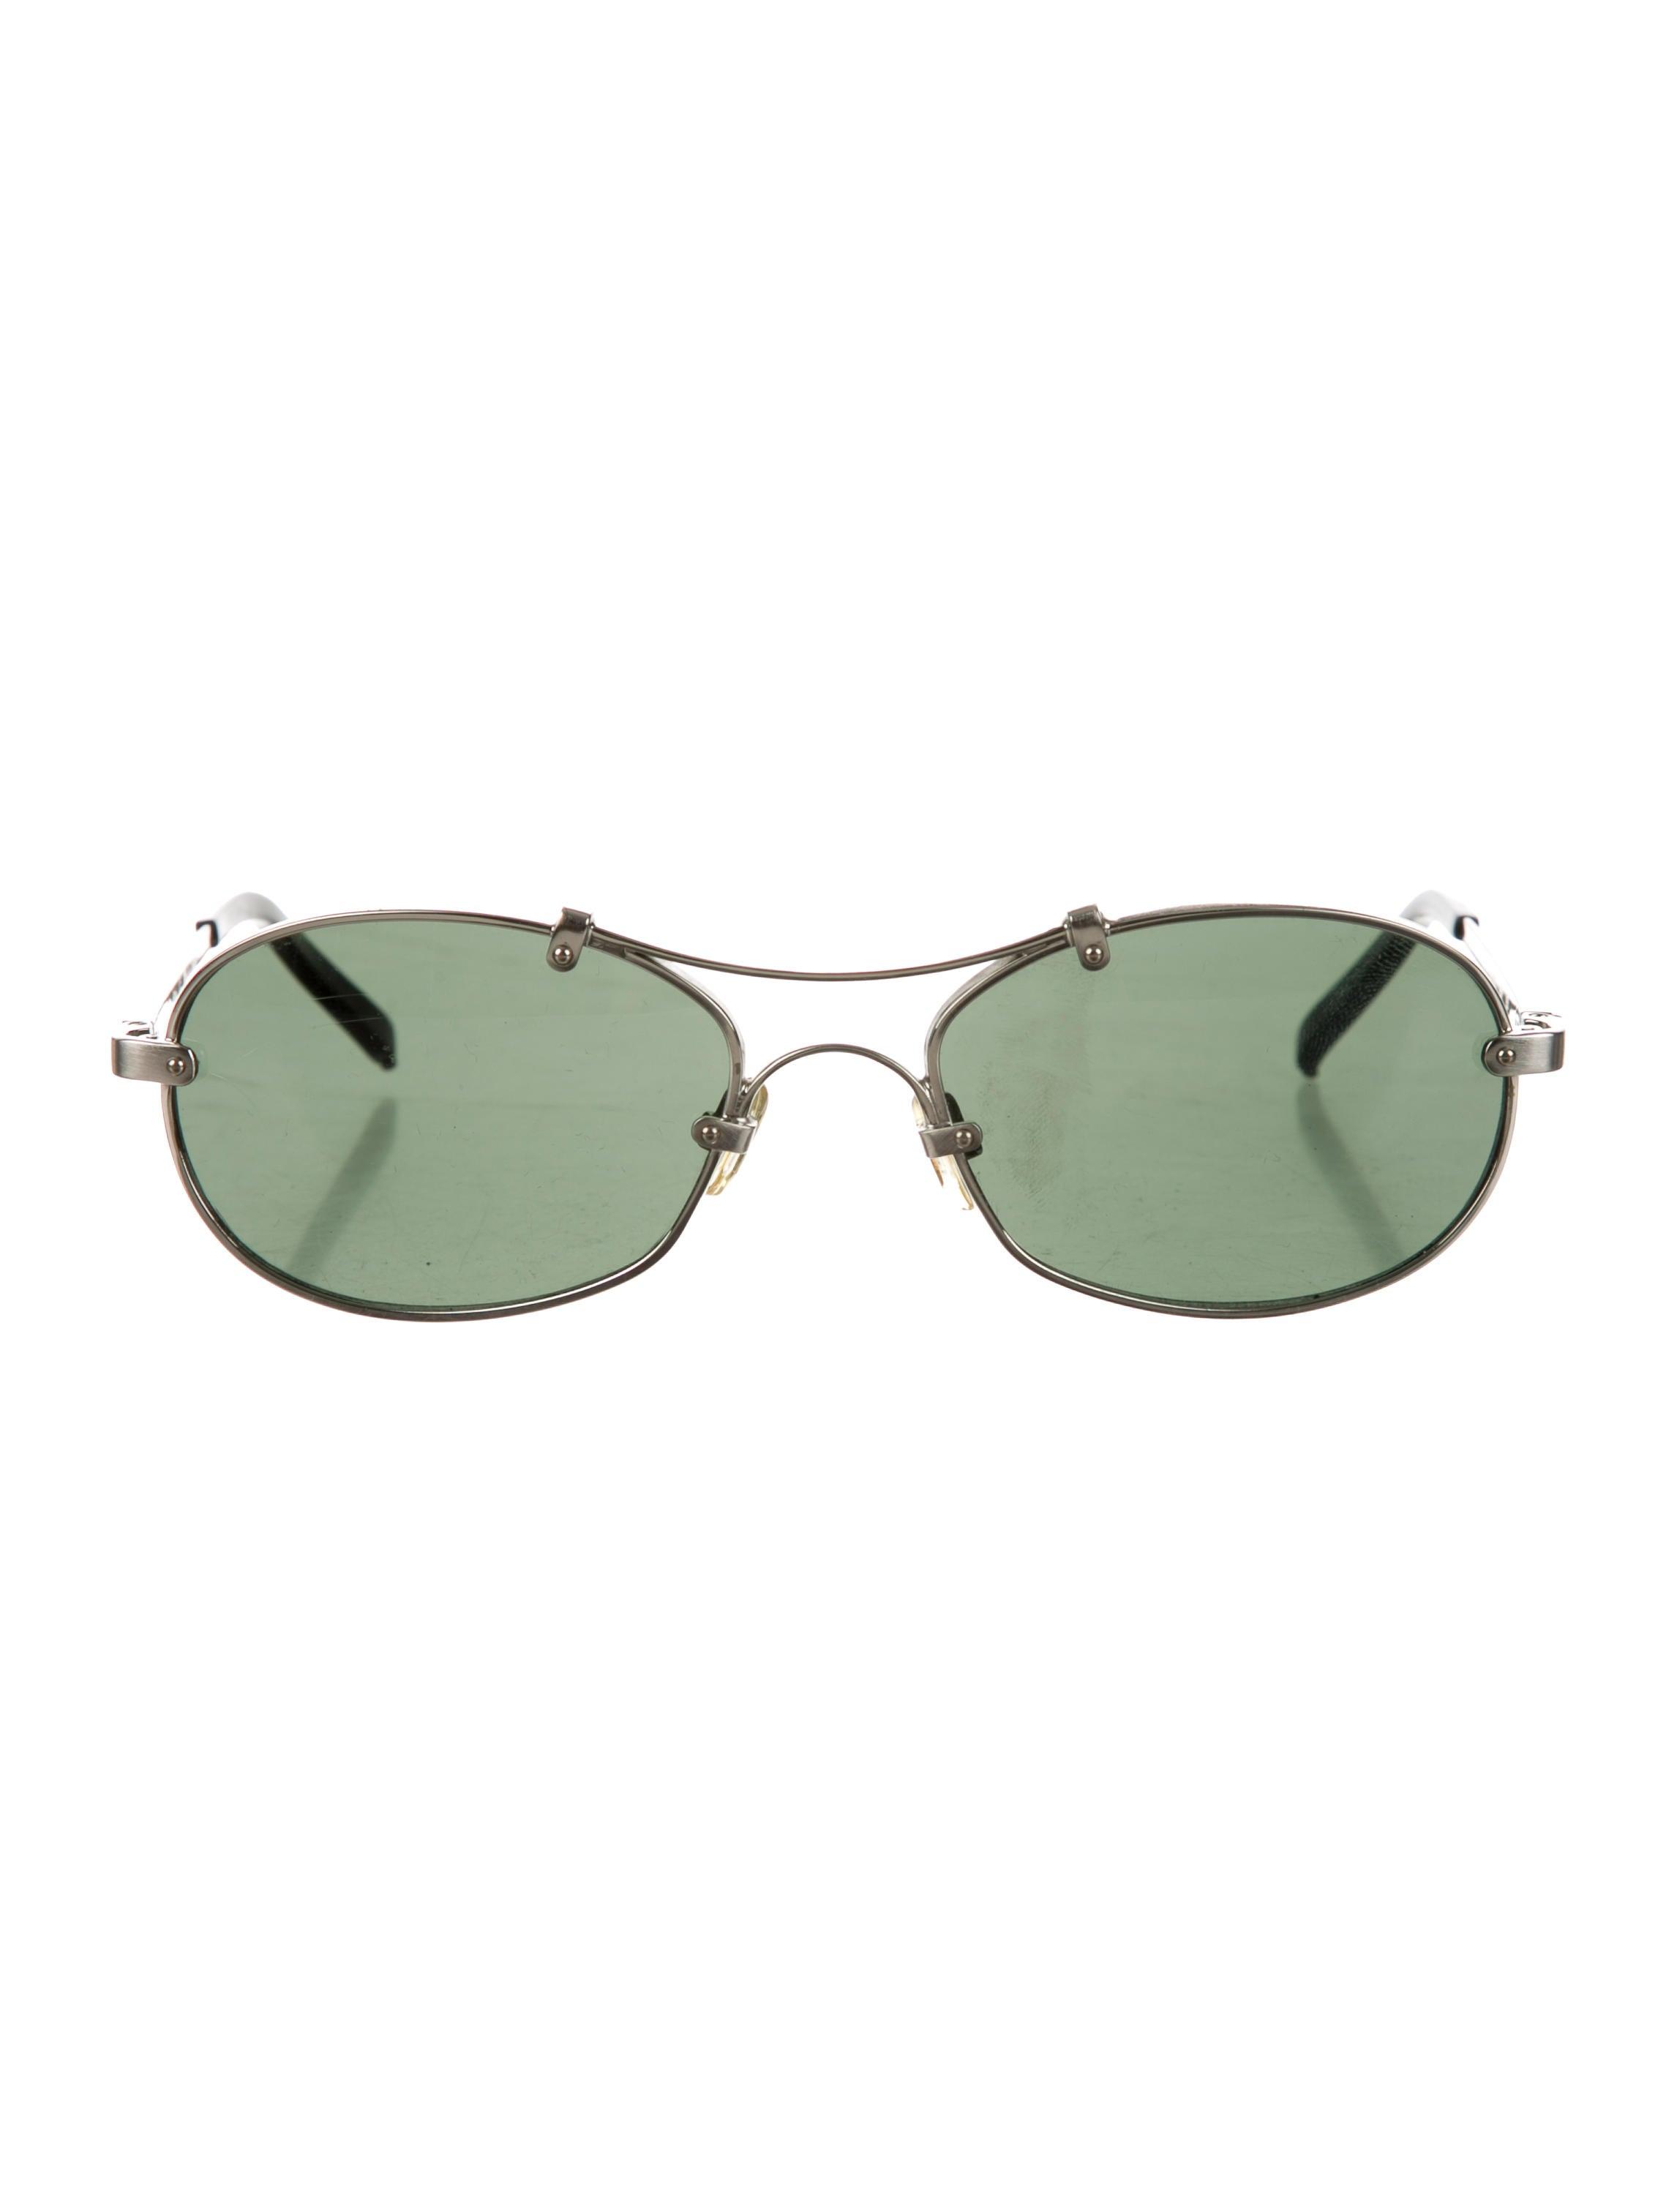 9c6a89c7ac Chloé Tinted Sunglasses - Accessories - CHL45068